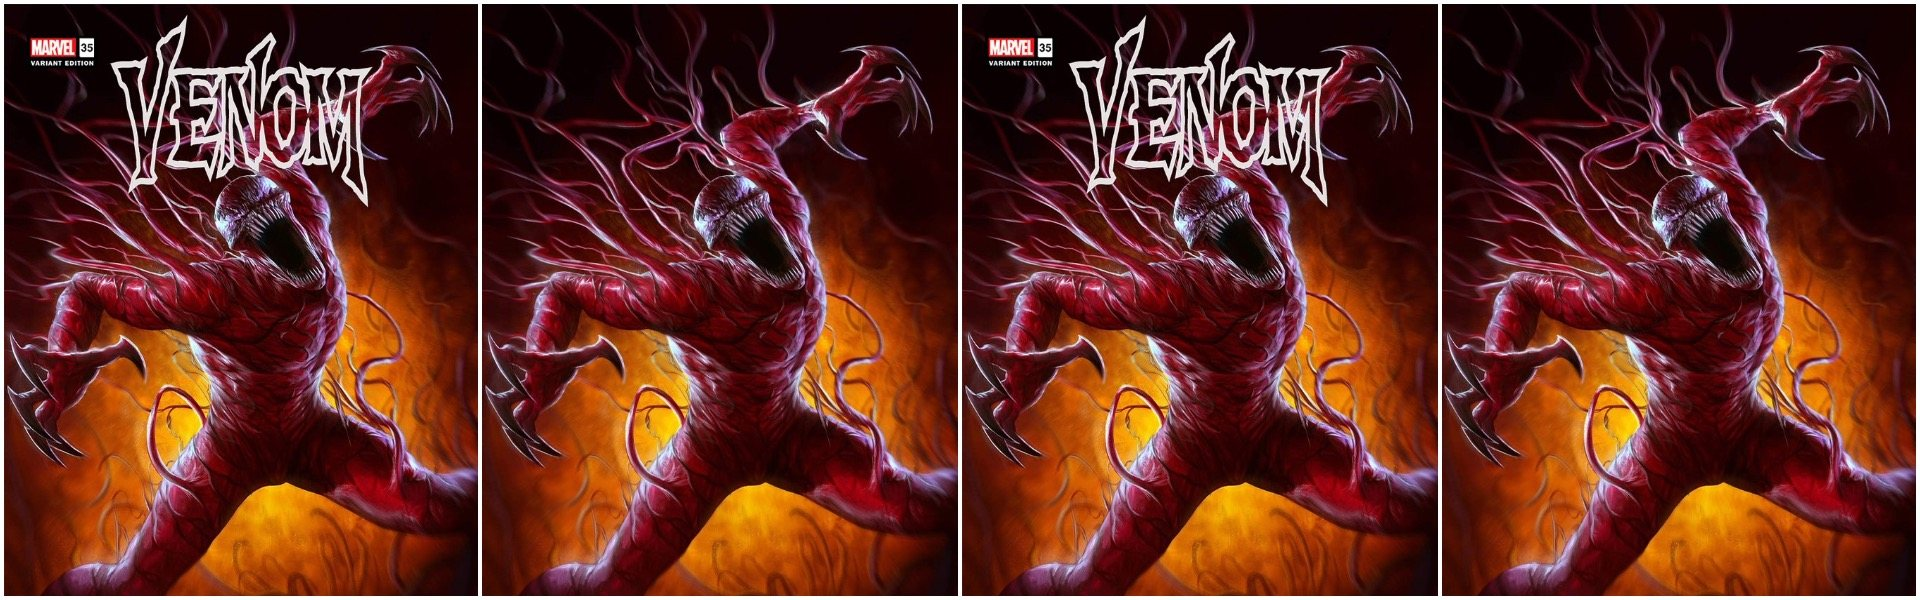 Venom #35 200th Issue Dave Rapoza Variants